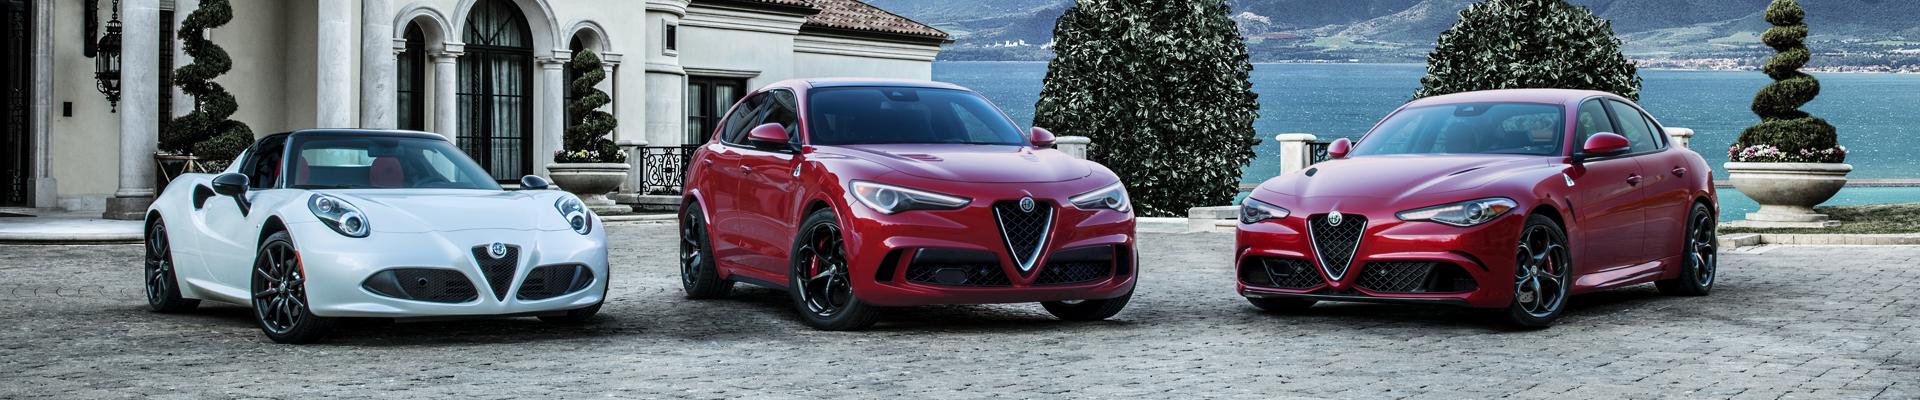 New Alfa Romeo Models | The Autobarn Alfa Romeo of Evanston